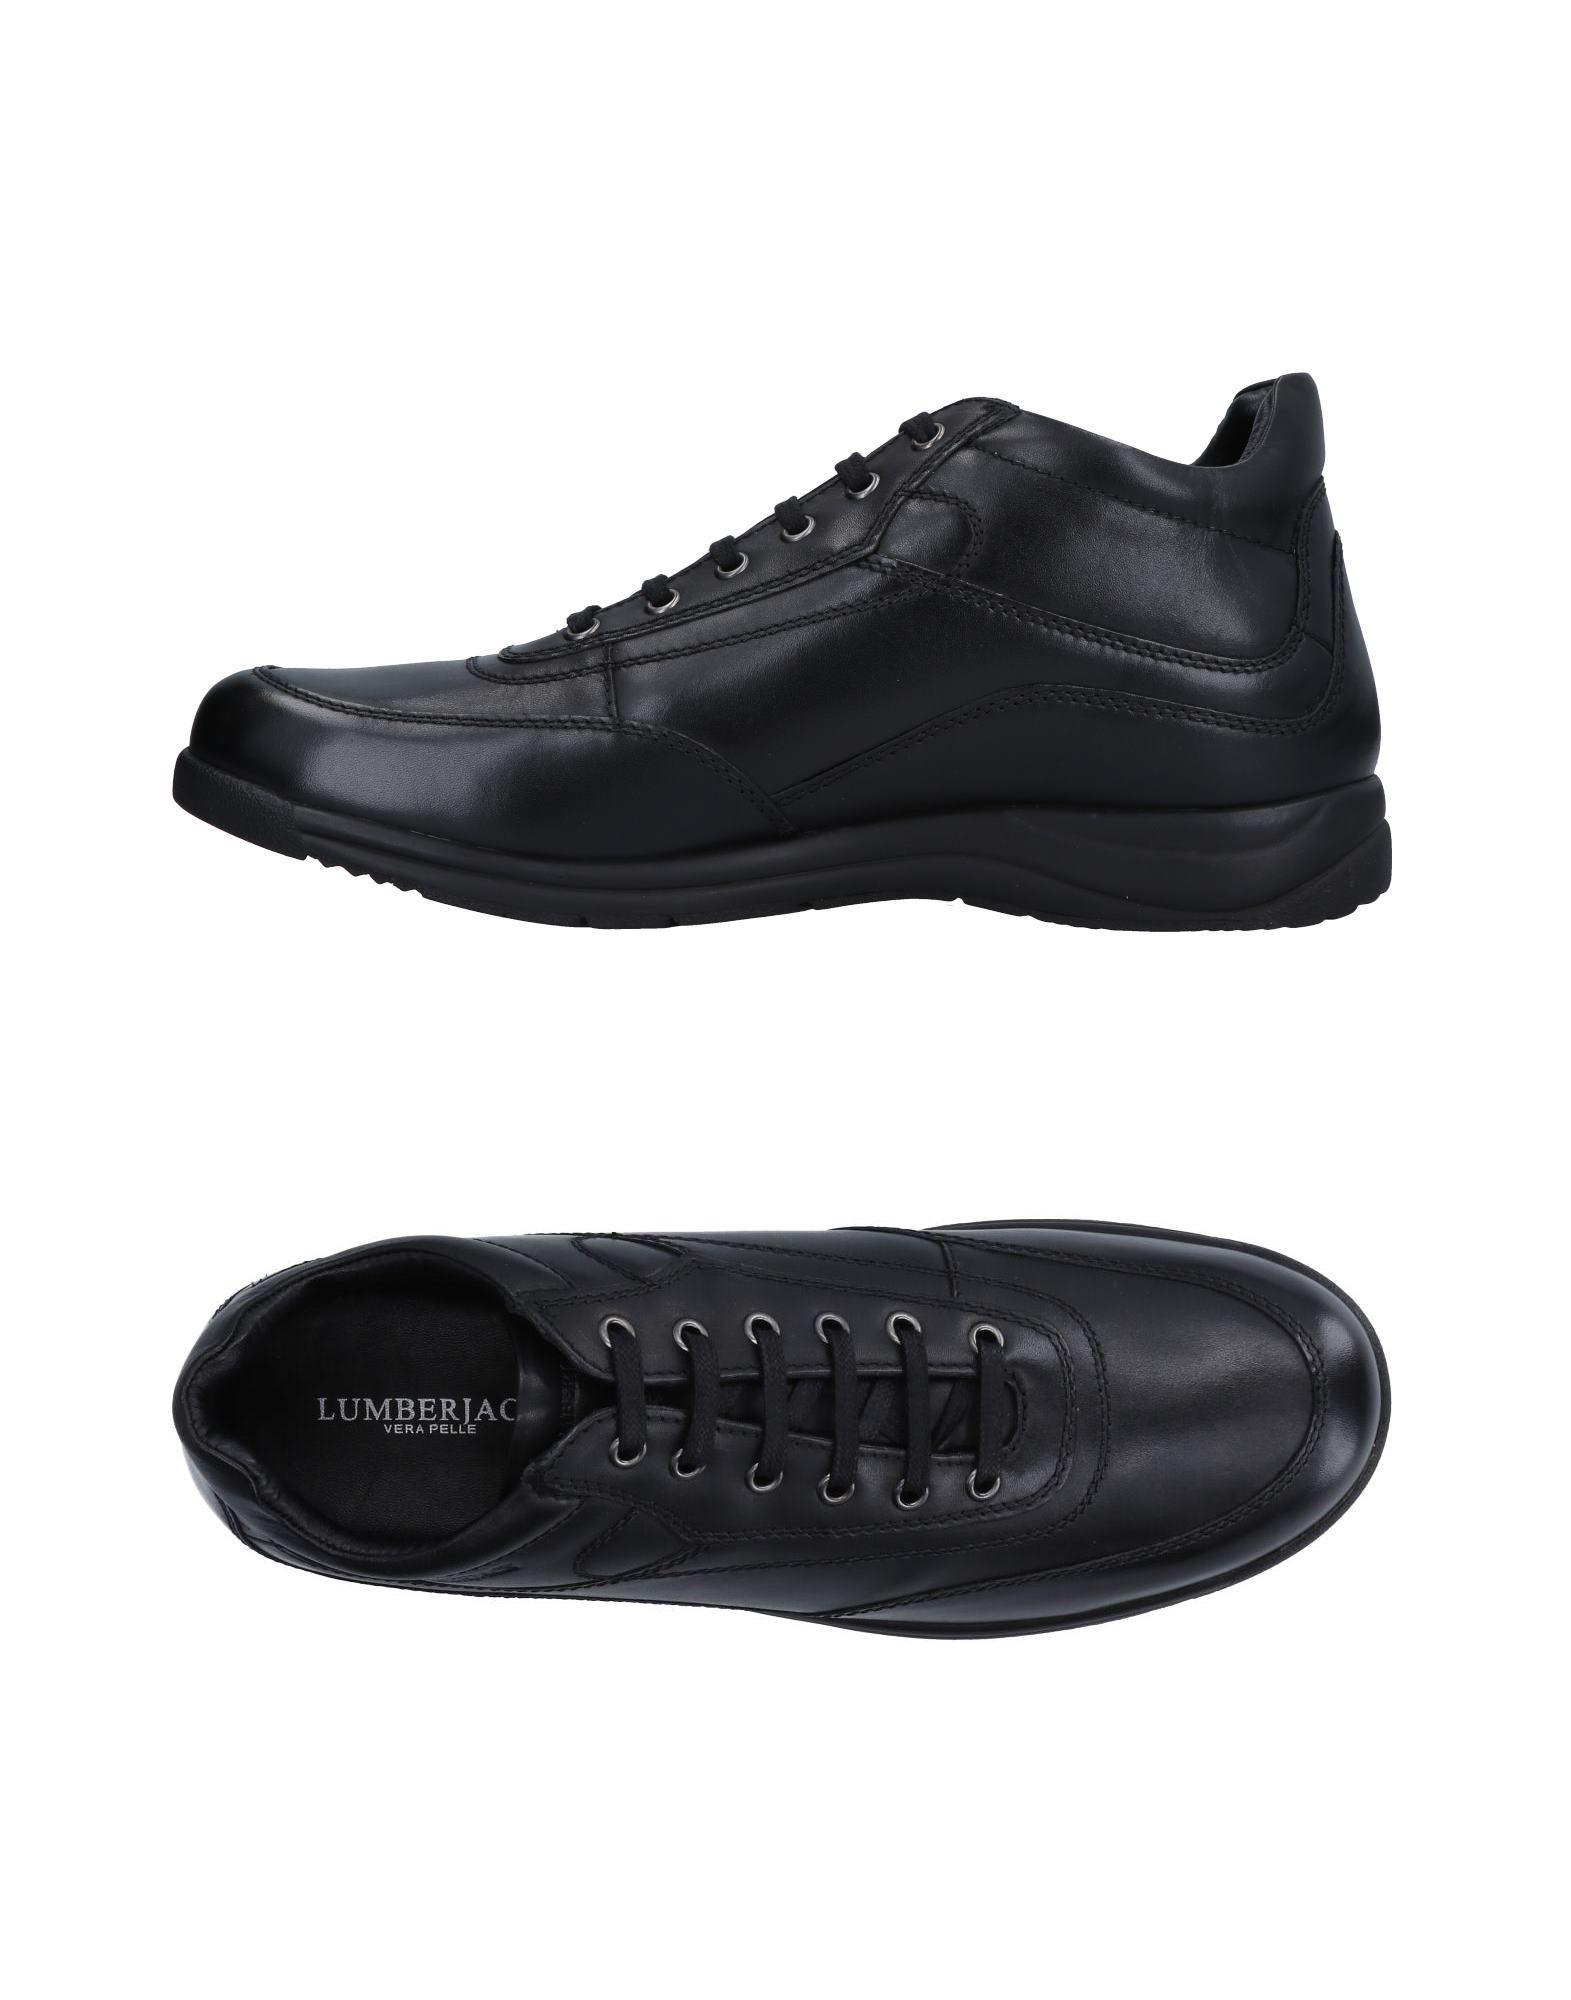 Lumberjack Sneakers Herren  11505627UO 11505627UO  269e4e